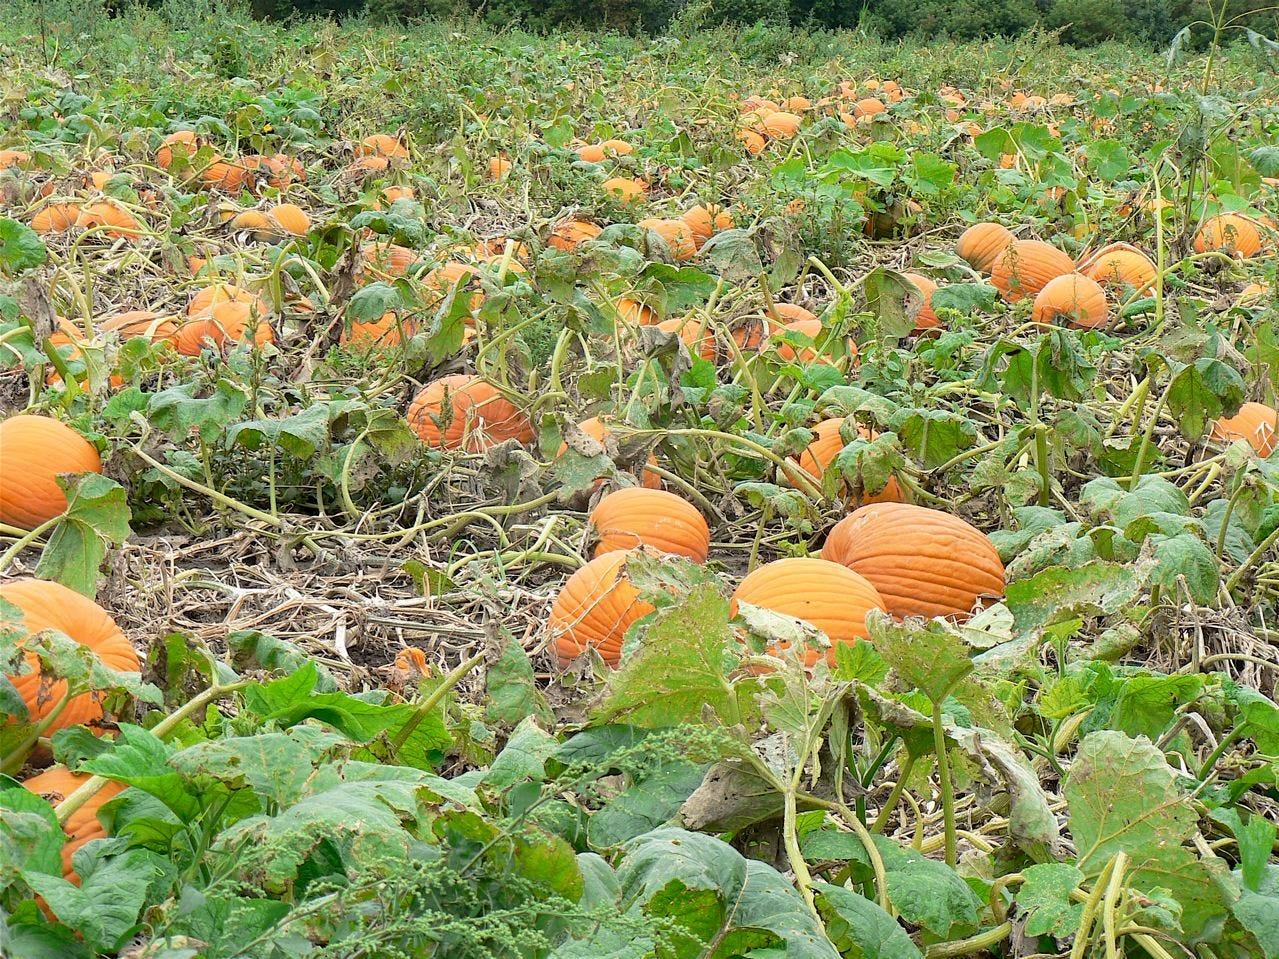 Pumpkins, lots of pumpkins in the patch.